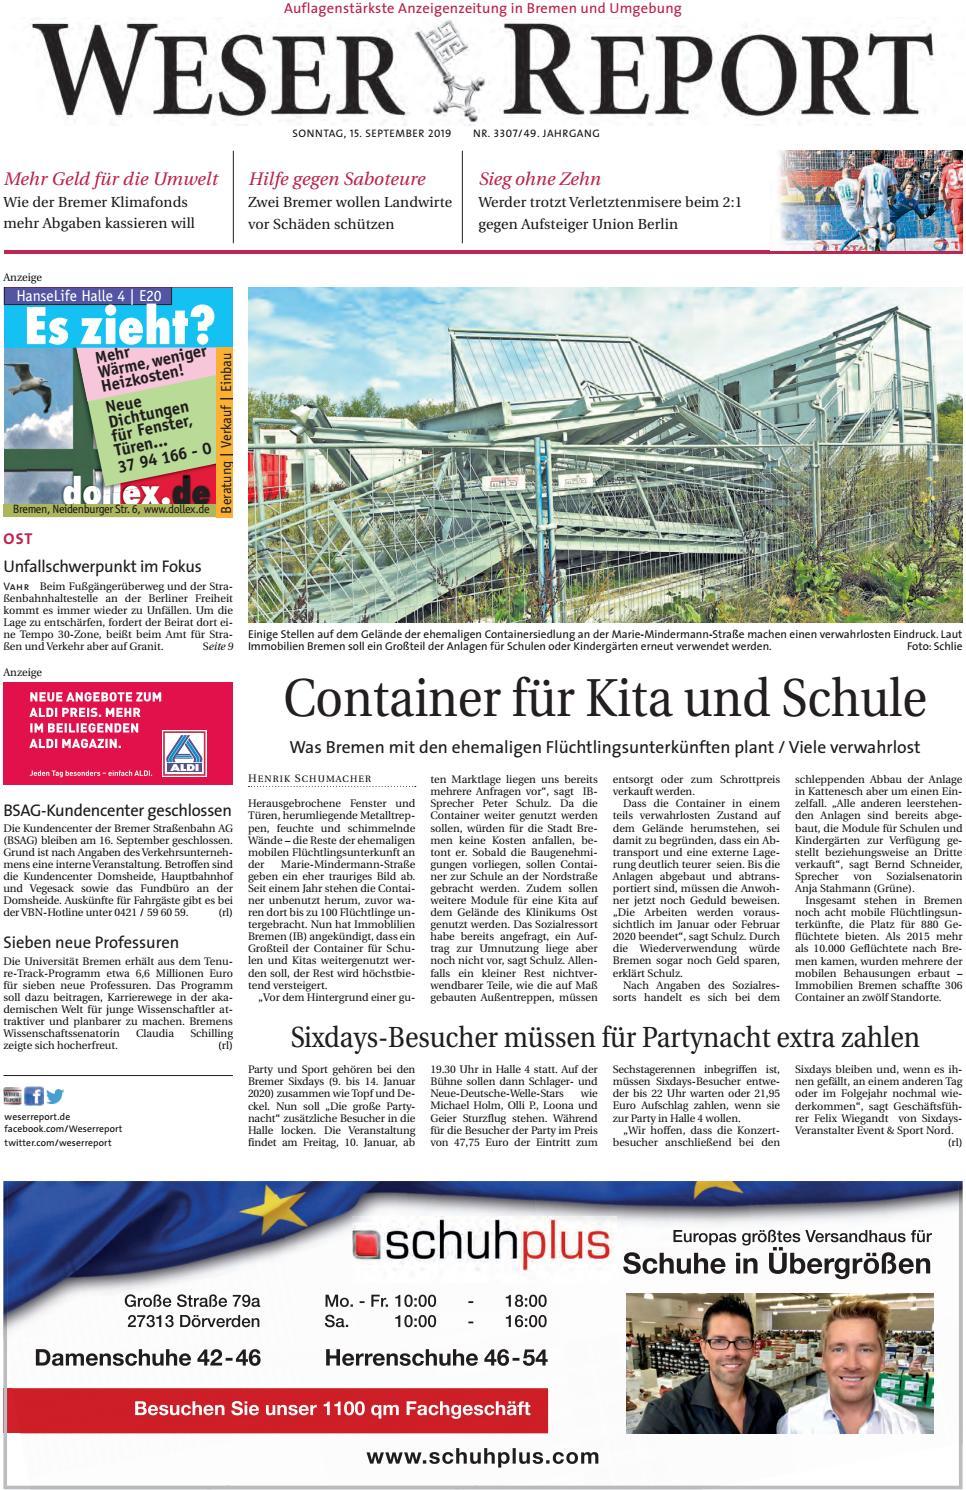 Weser Report Ost vom 15.09.2019 by KPS Verlagsgesellschaft